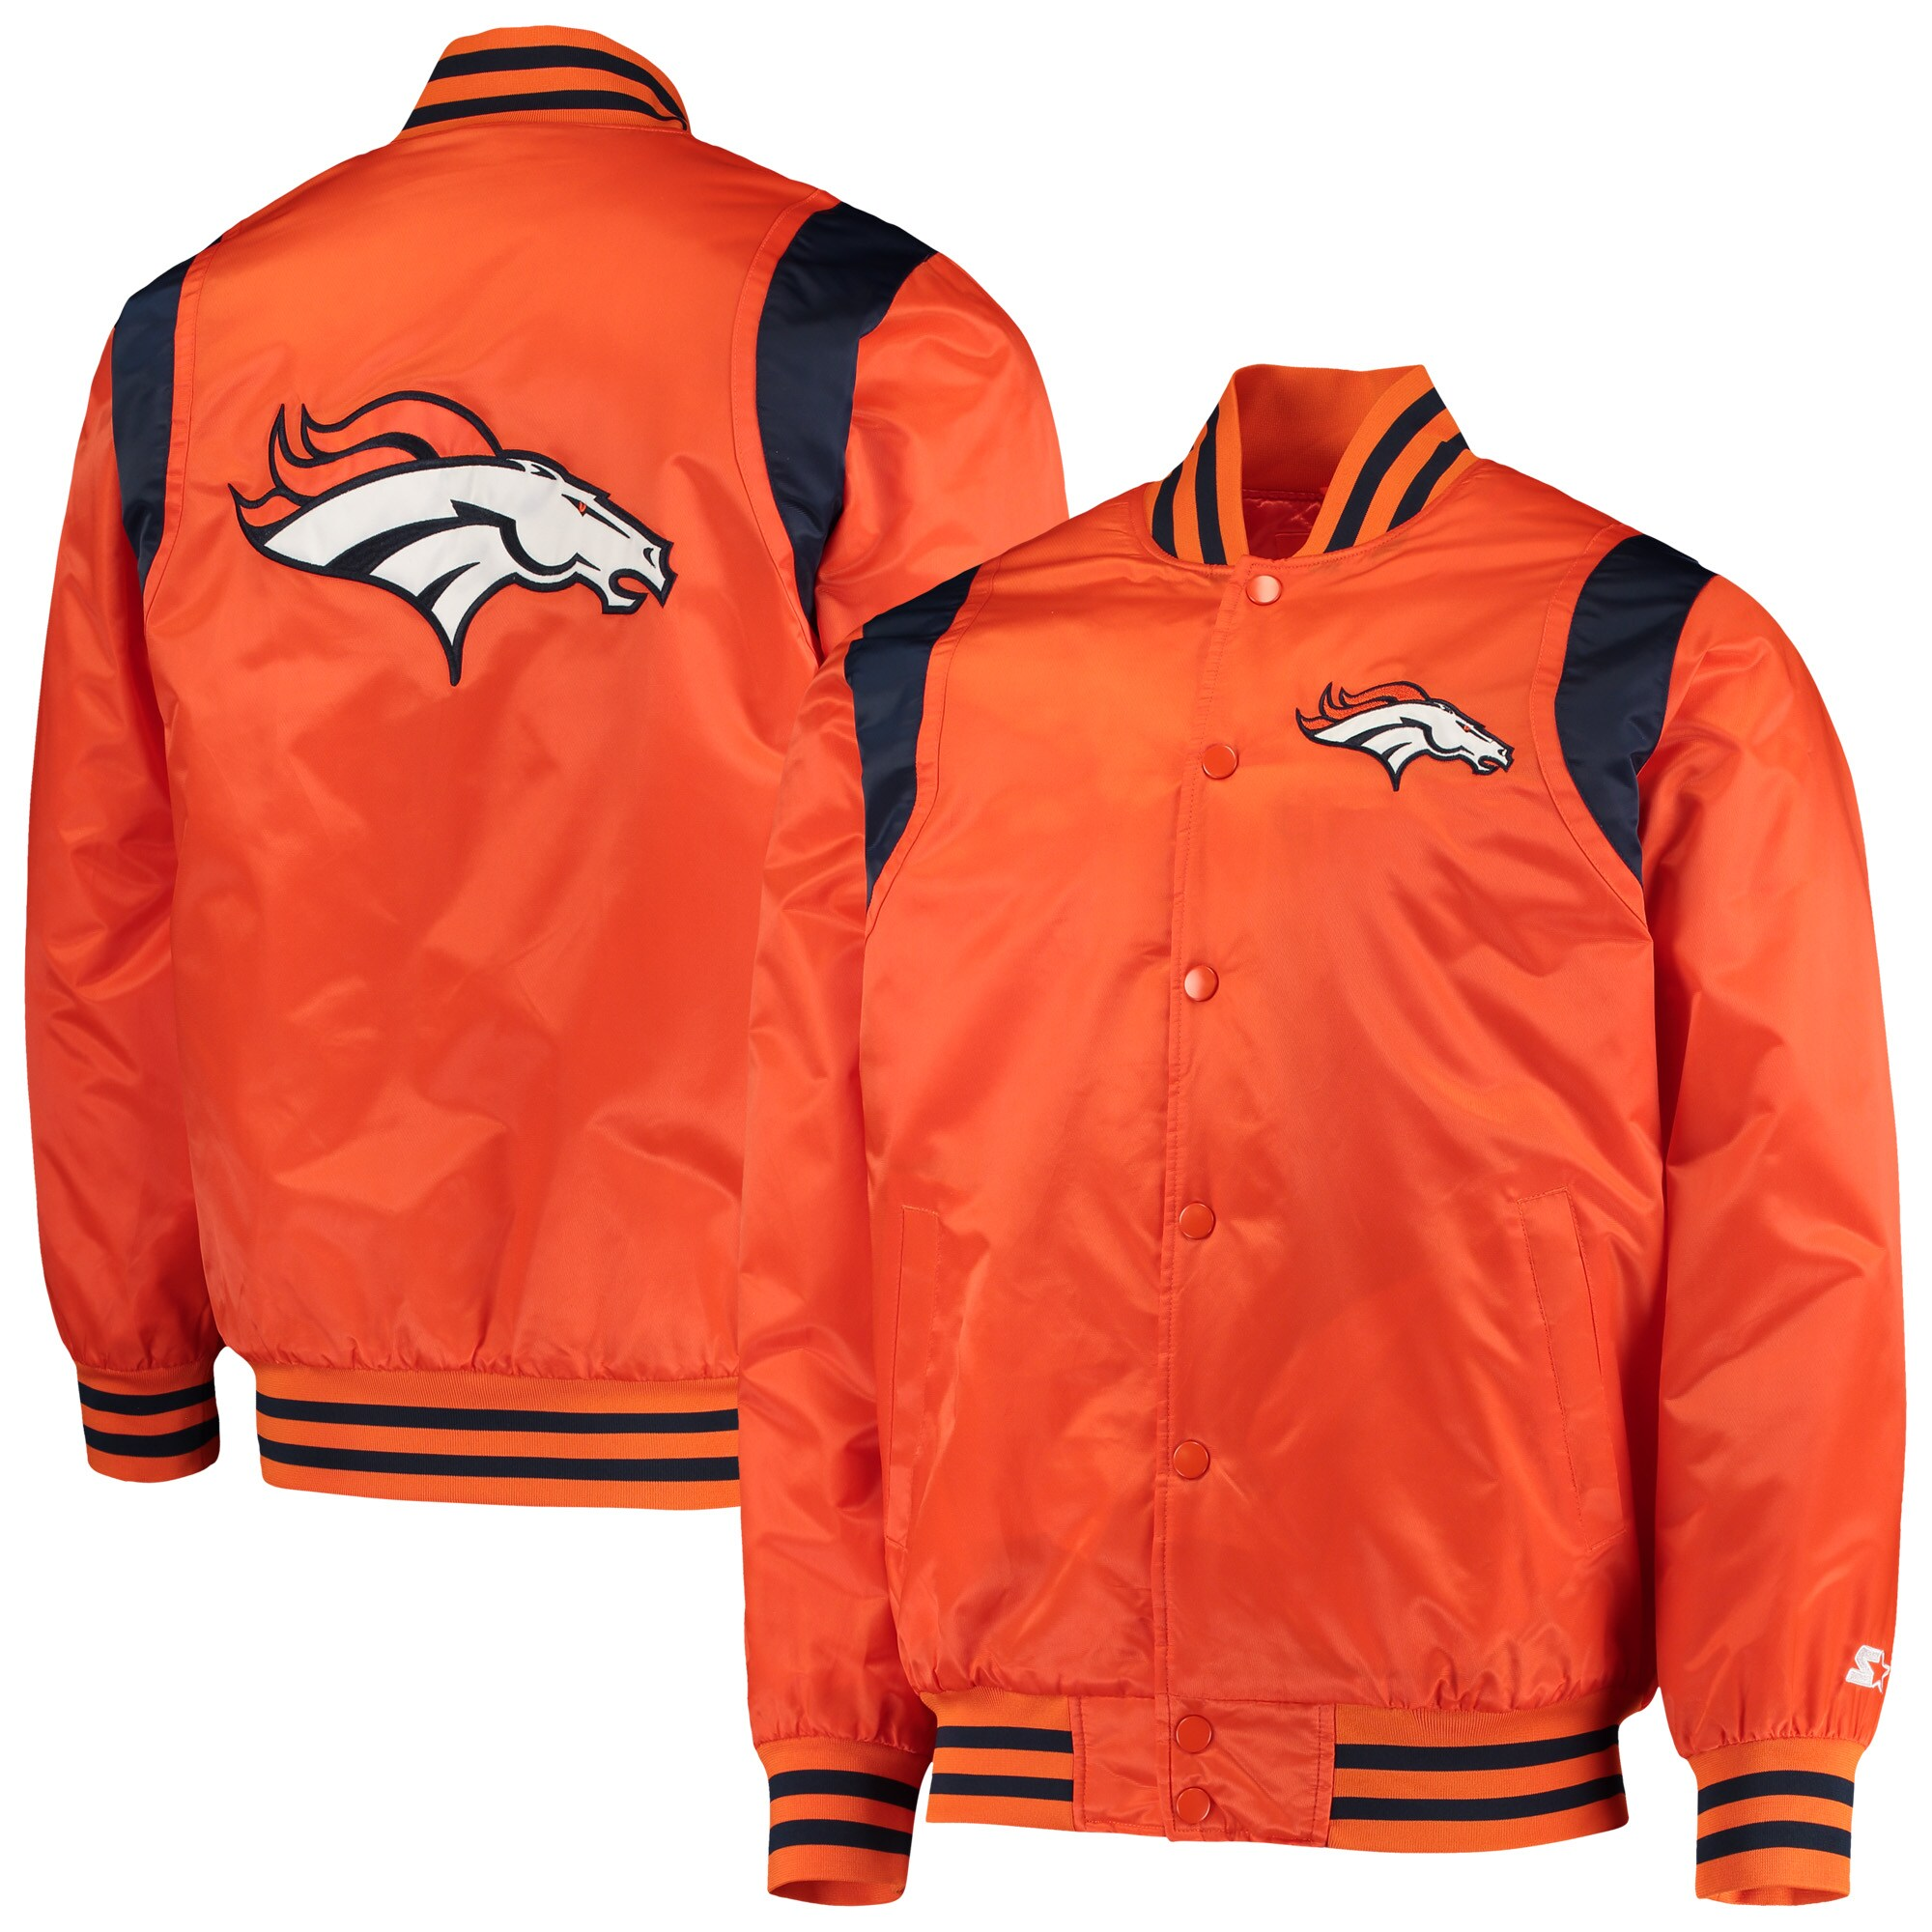 Denver Broncos Starter Prime Time Twill Satin Varsity Full-Snap Jacket - Orange/Navy